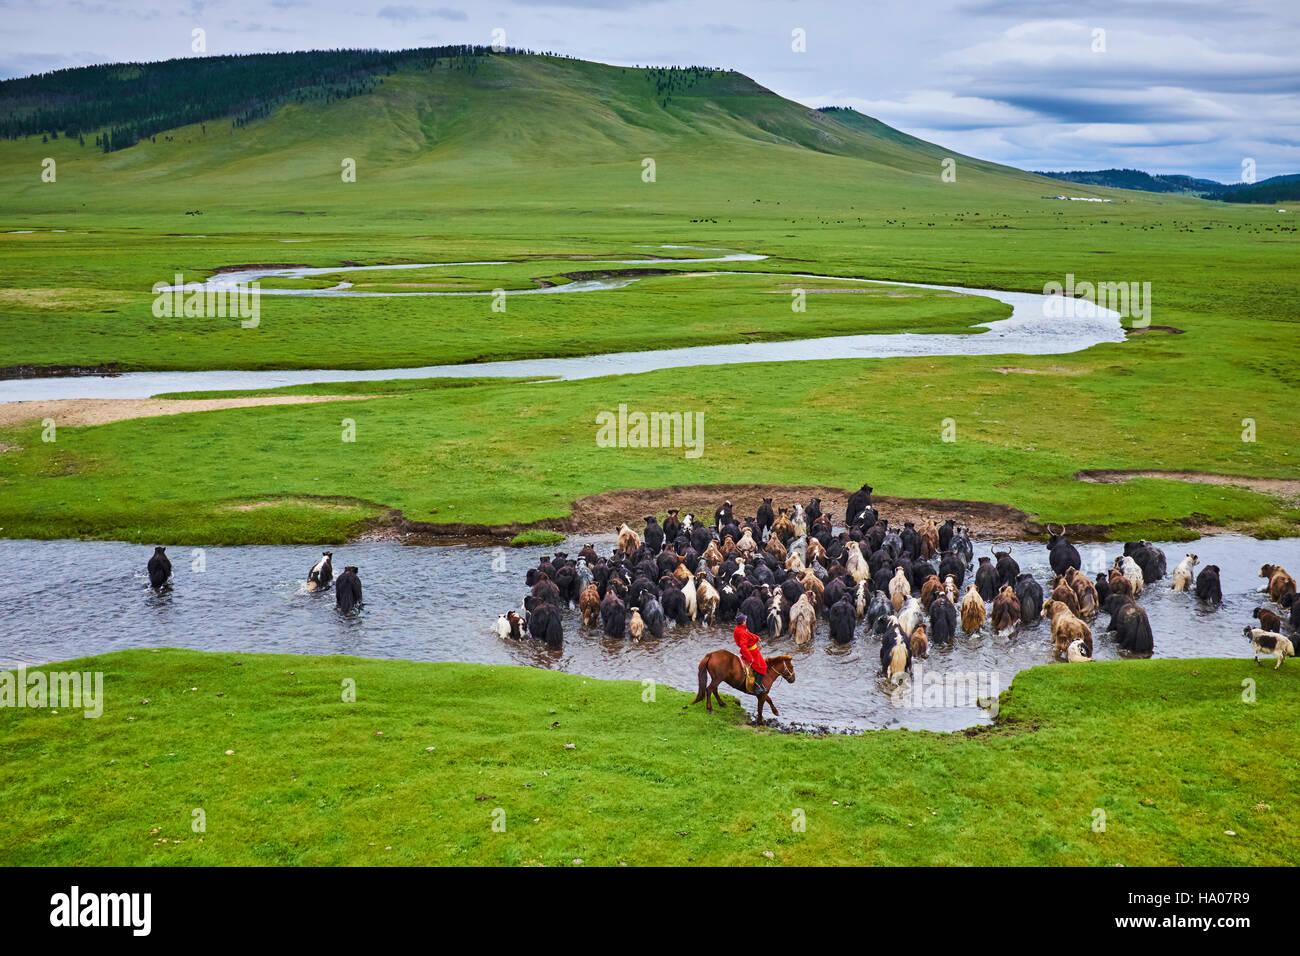 Mongolia, Arkhangai province,  Mongolian horserider with a herd of yaks Stock Photo